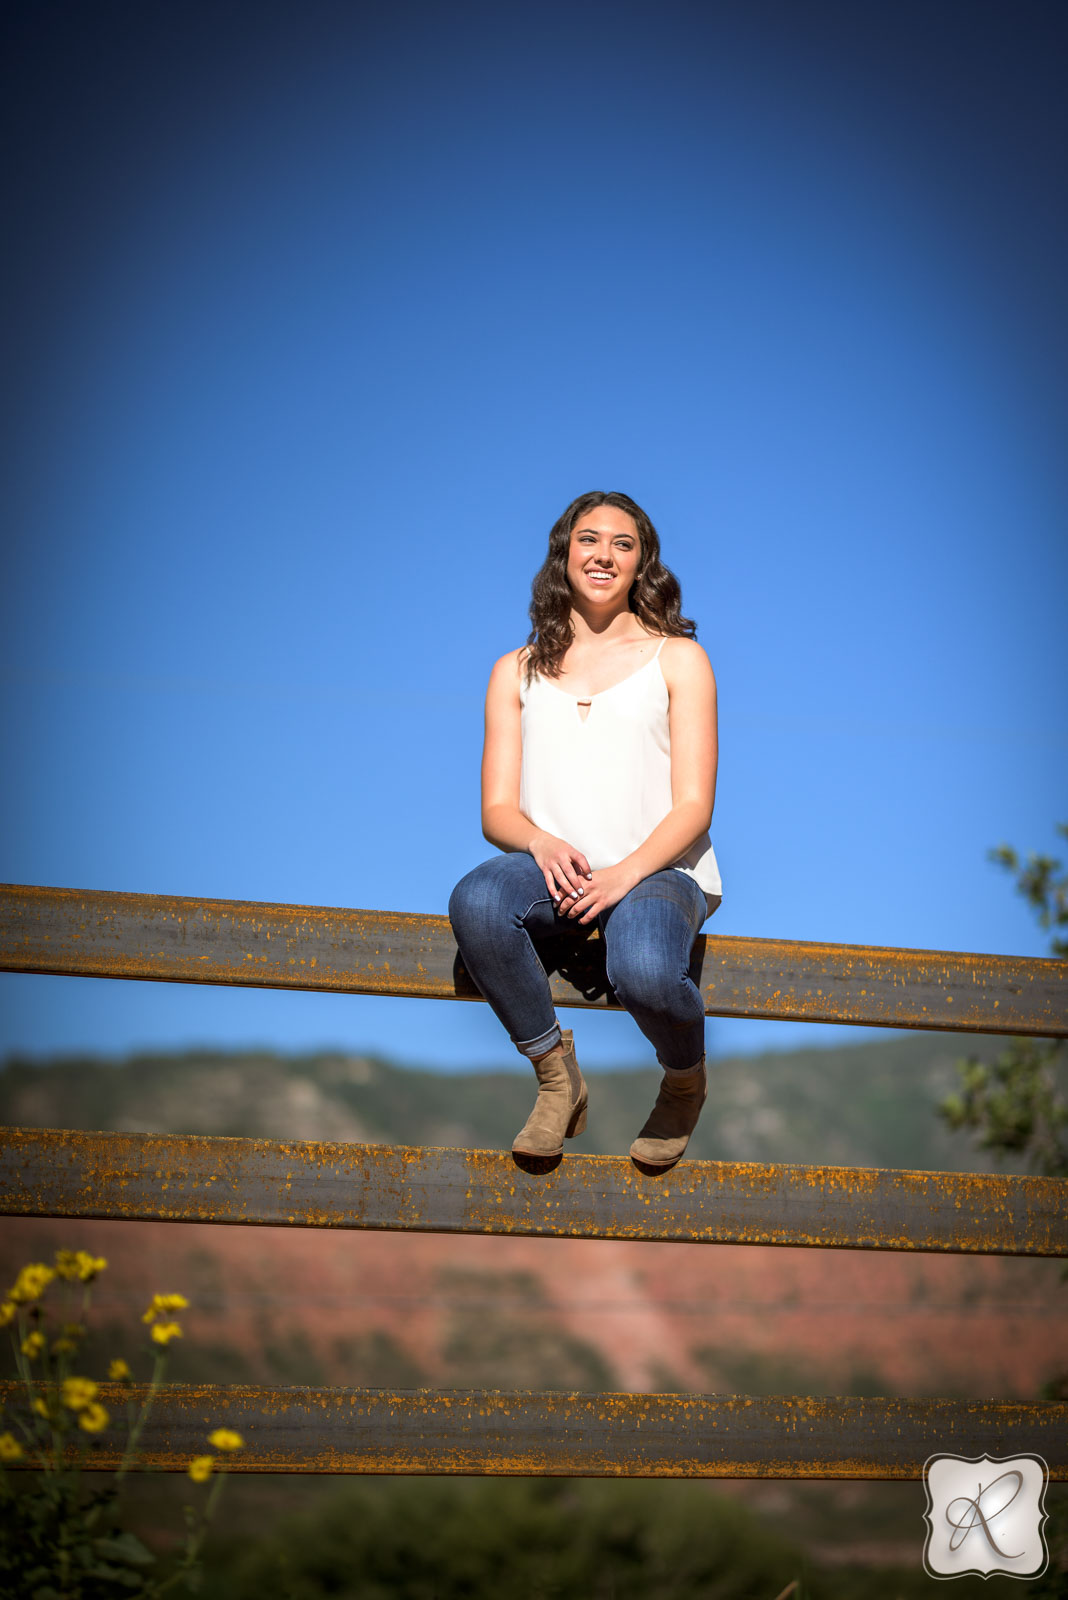 Durango Colorado Senior Portraits By Allison Ragsdale Photography in Durango CO. Friend and Senior Shoot, Durango